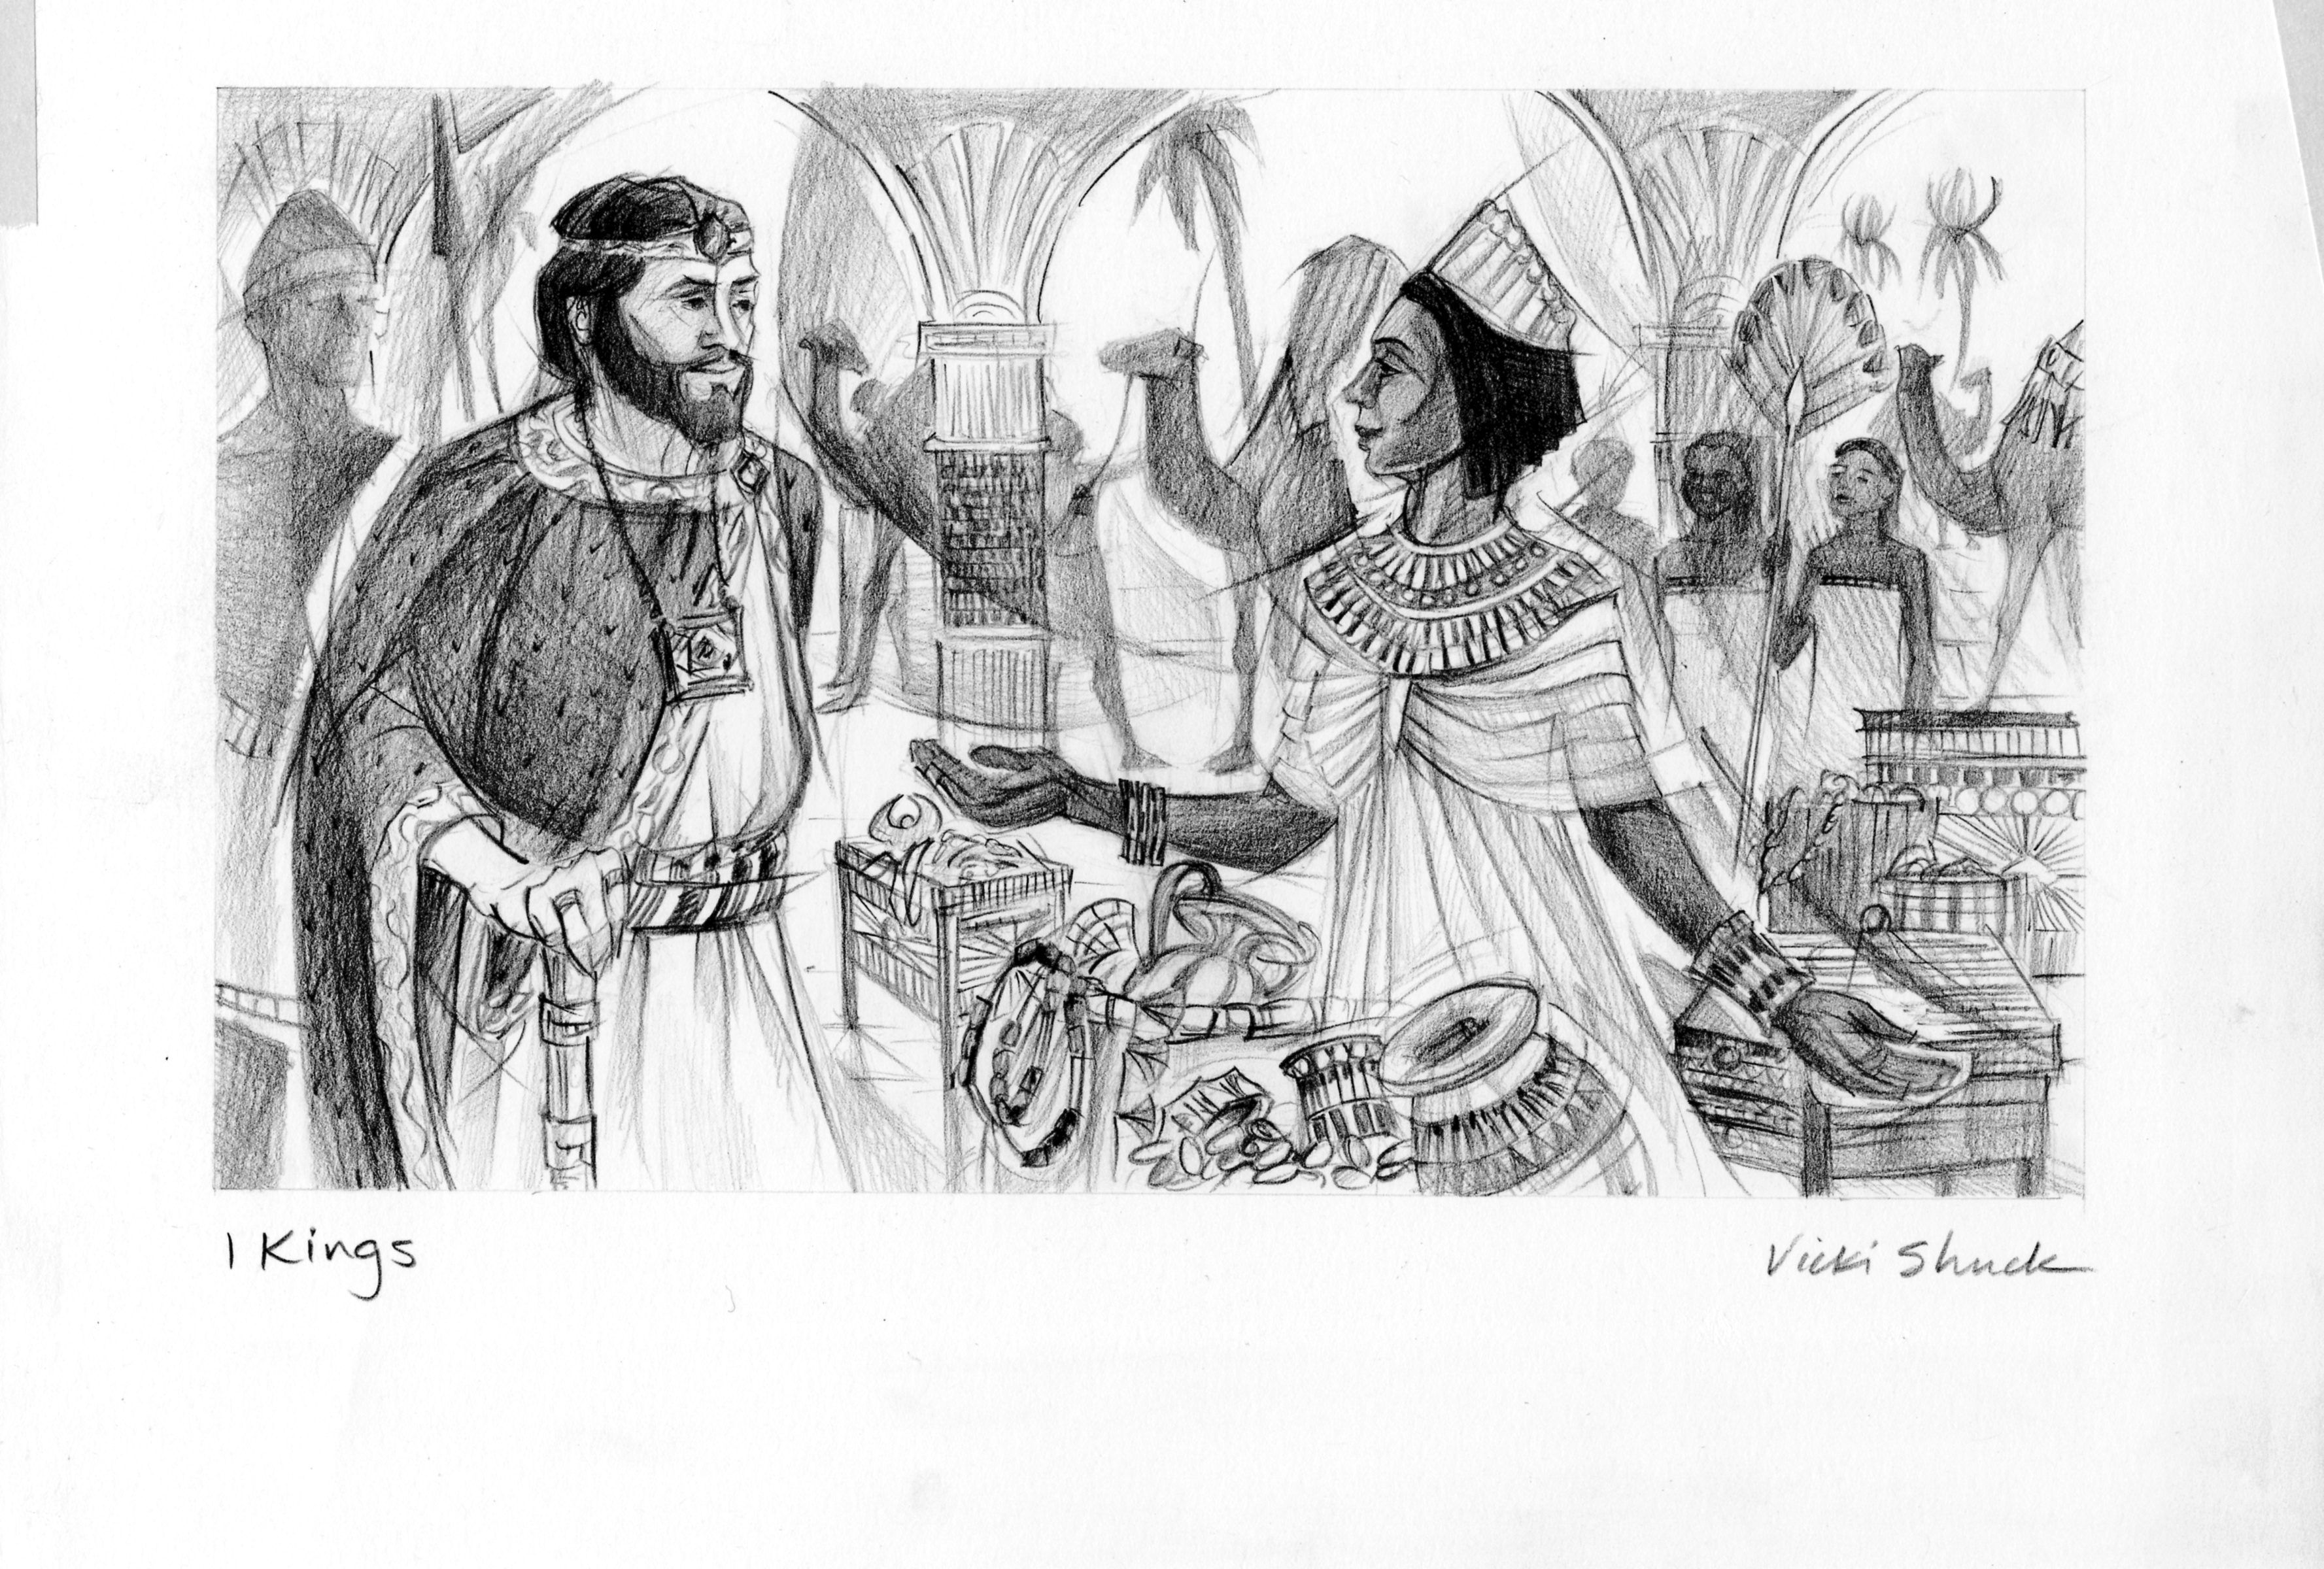 Calendar Illustration Questions : Kings illustration queen of sheba saint mary s press